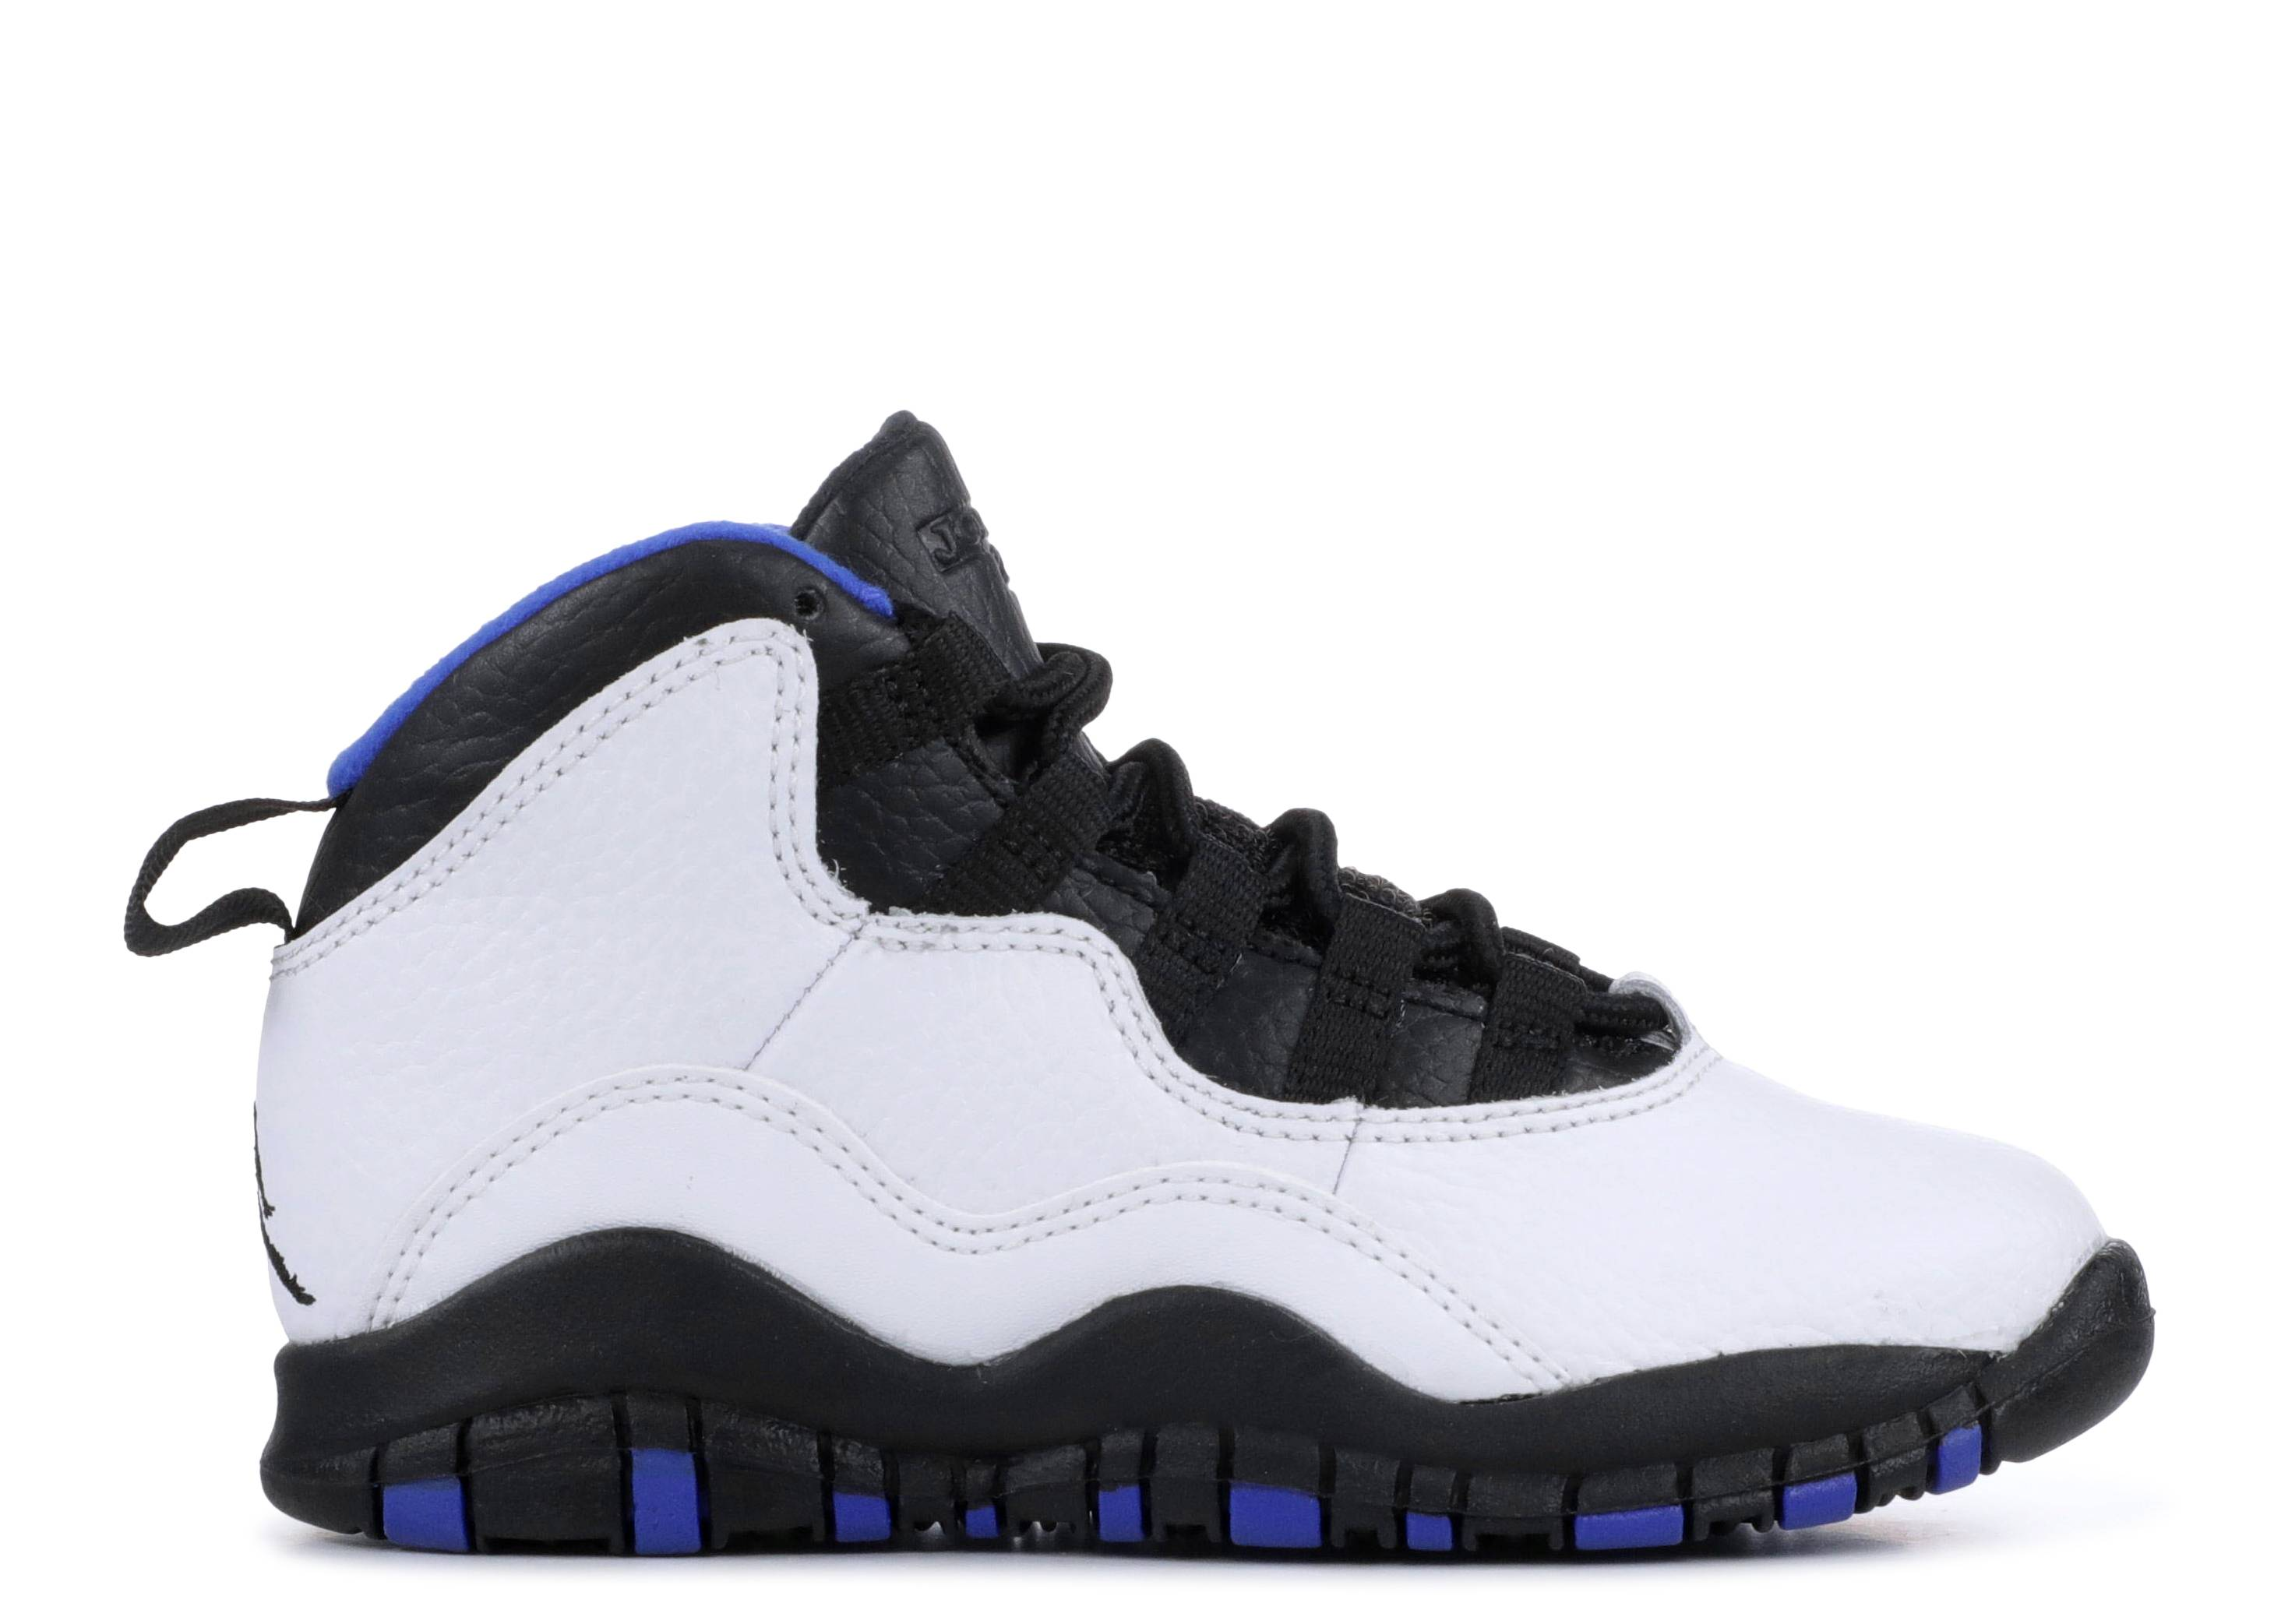 fe44d0e226d Air Jordan 10 (X) Shoes - Nike | Flight Club